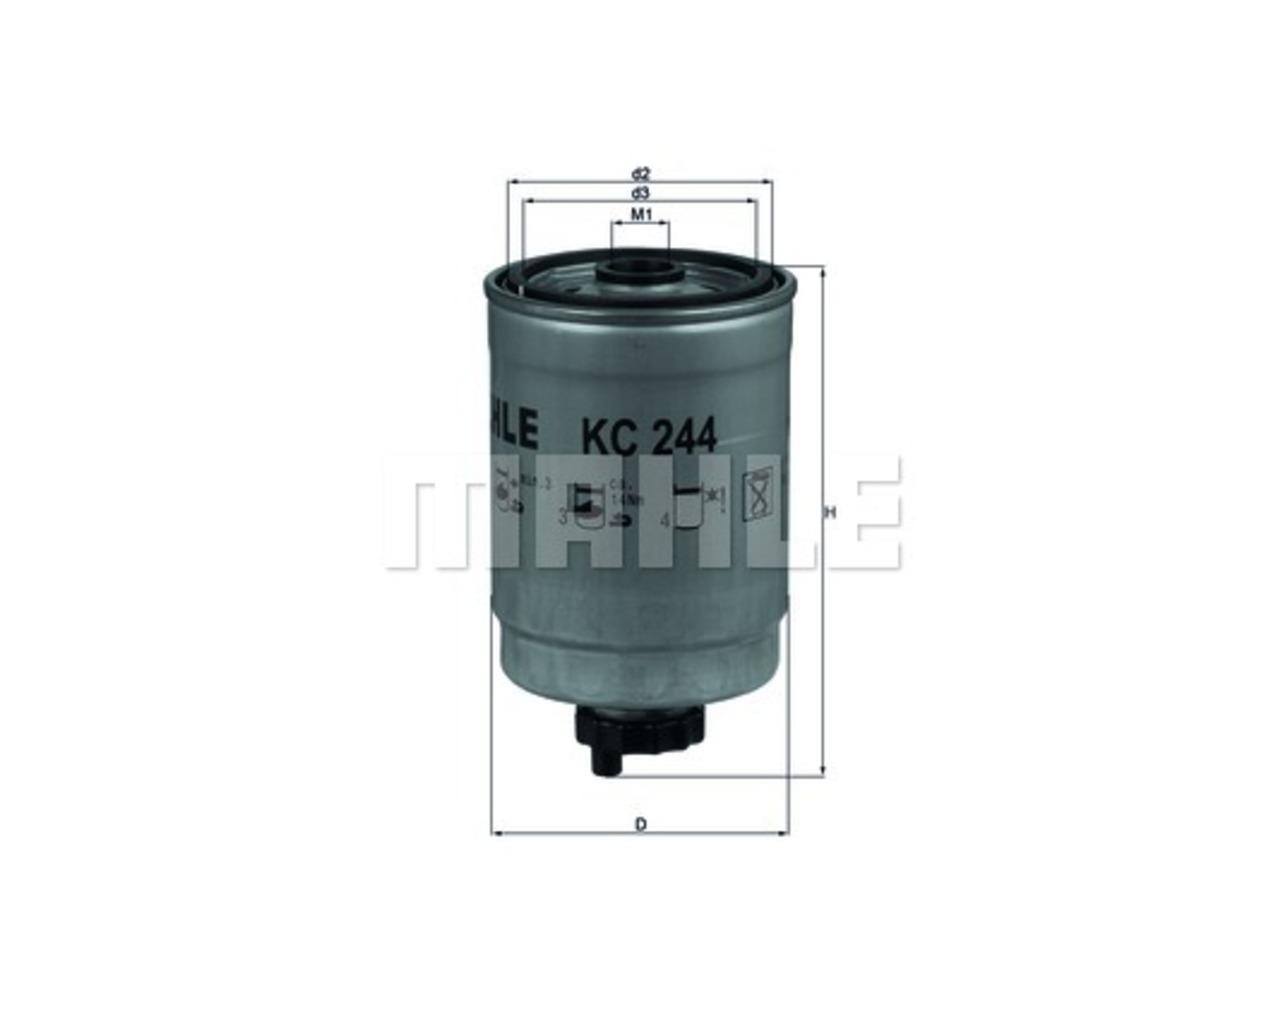 hight resolution of mahle fuel filter kc244 saab 9 3 single